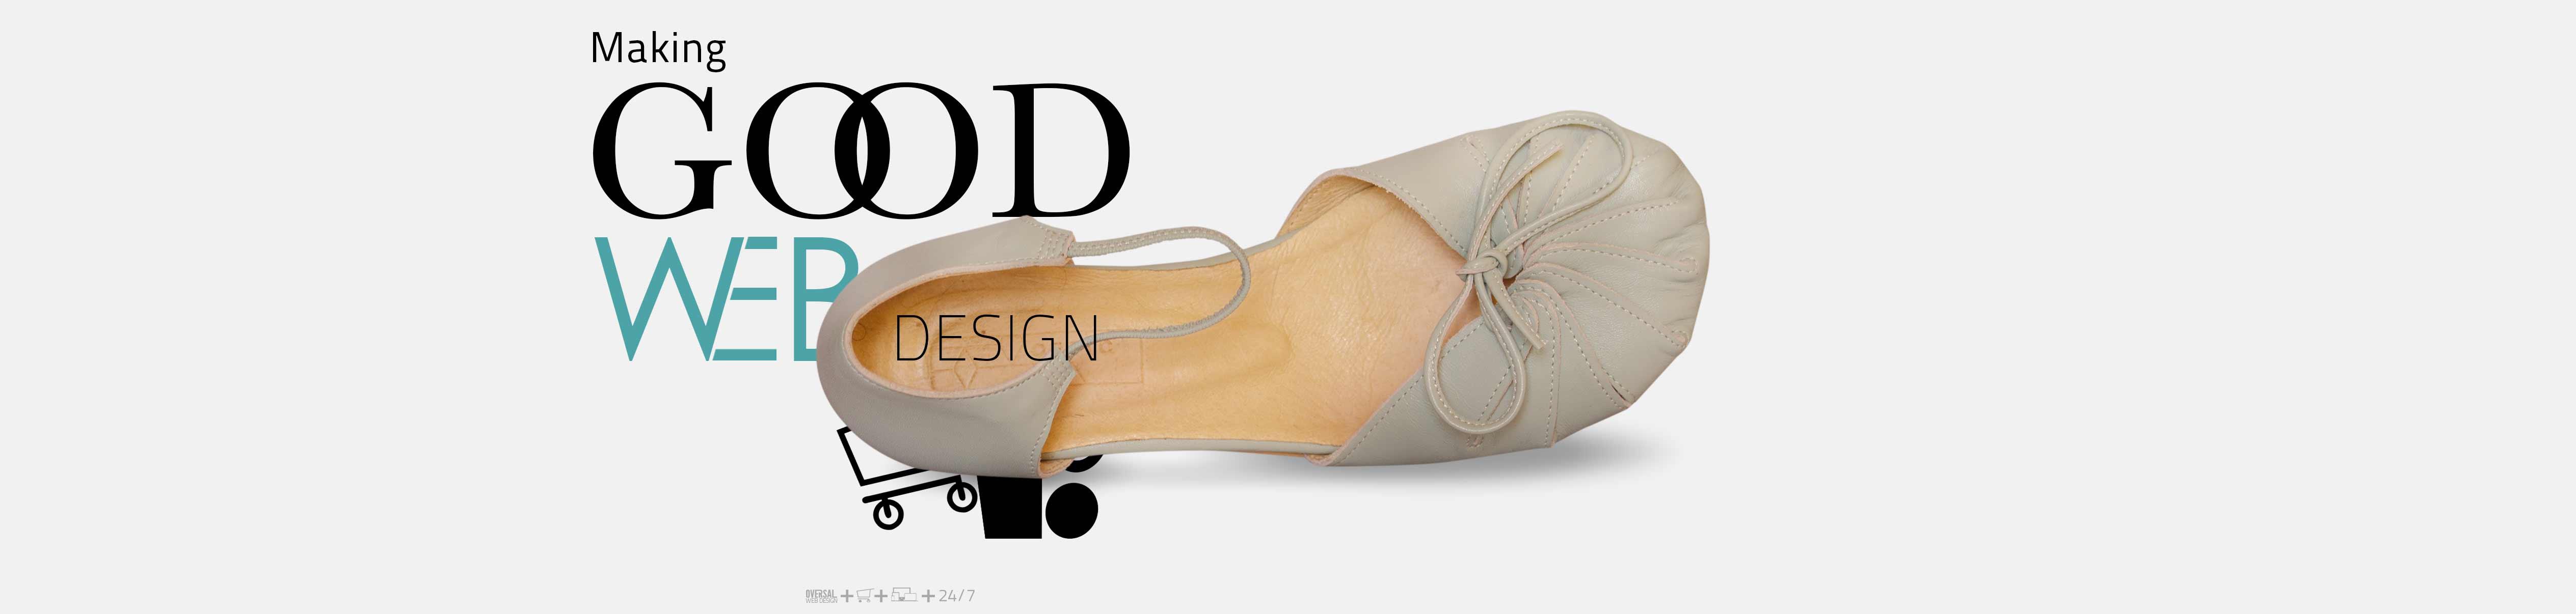 Light green pastel shoes, making good web design Oversal